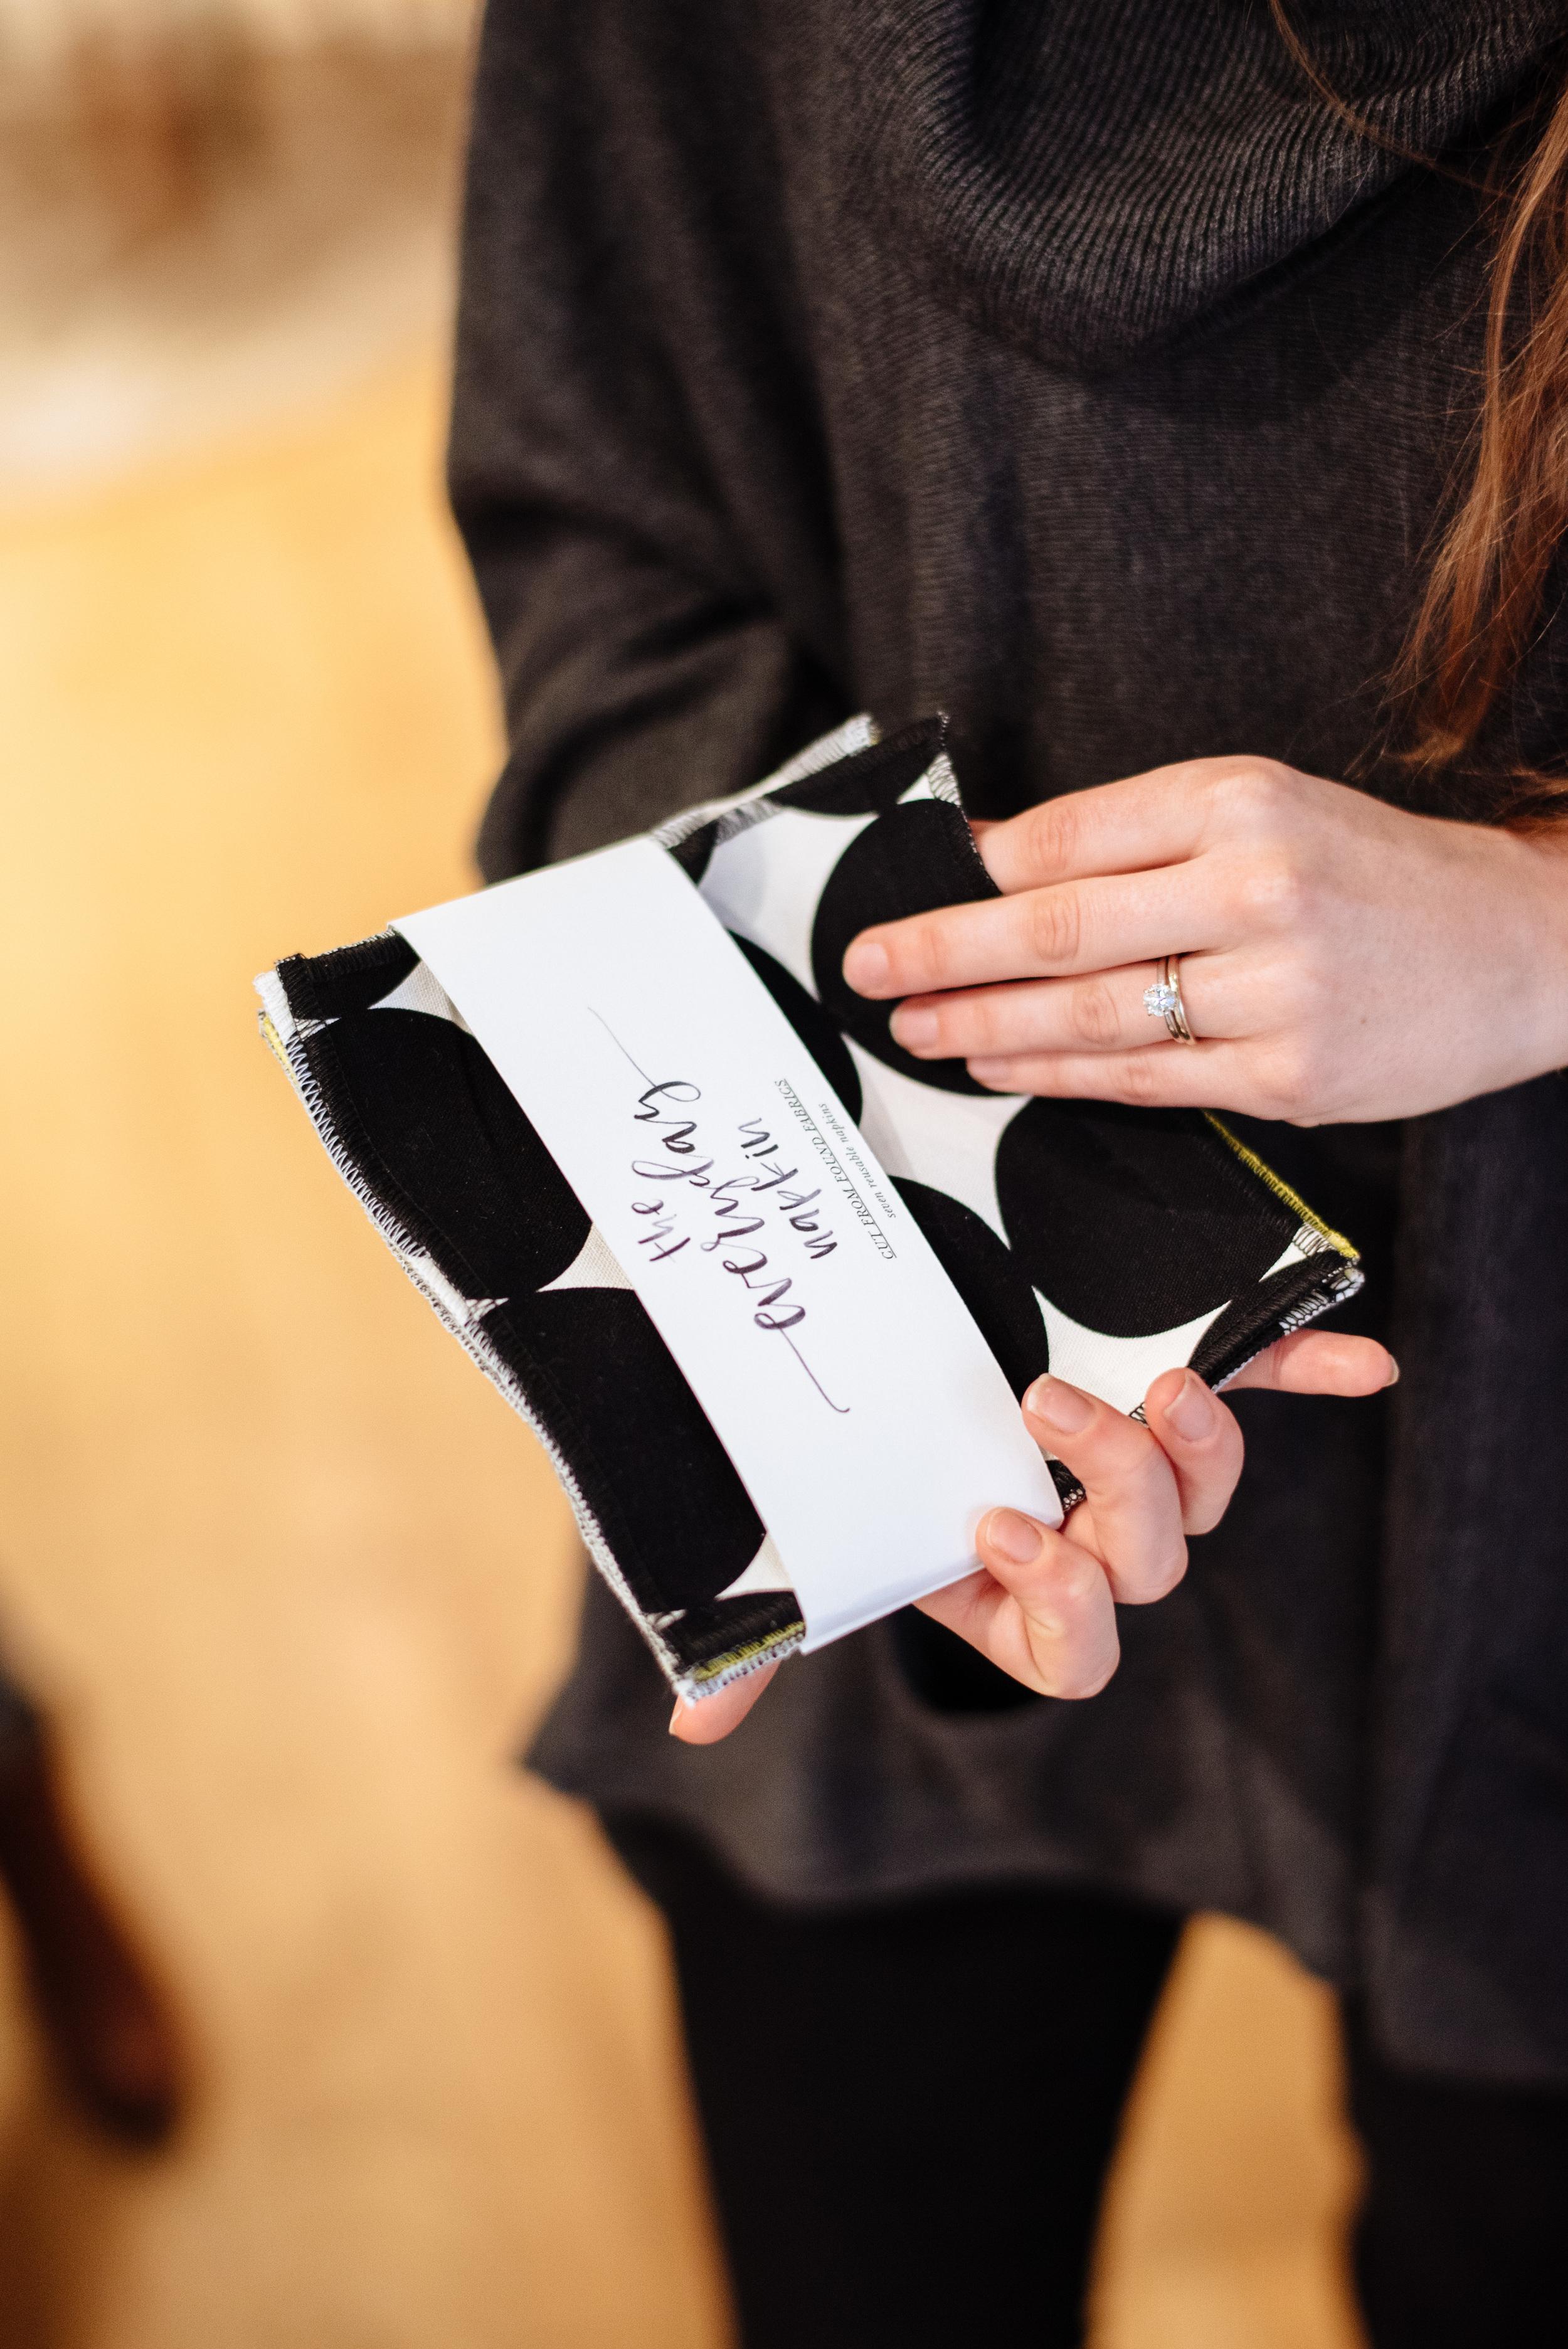 reusable-cloth-napkin-the-everyday-napkin-bash-studio-boston-west-elm